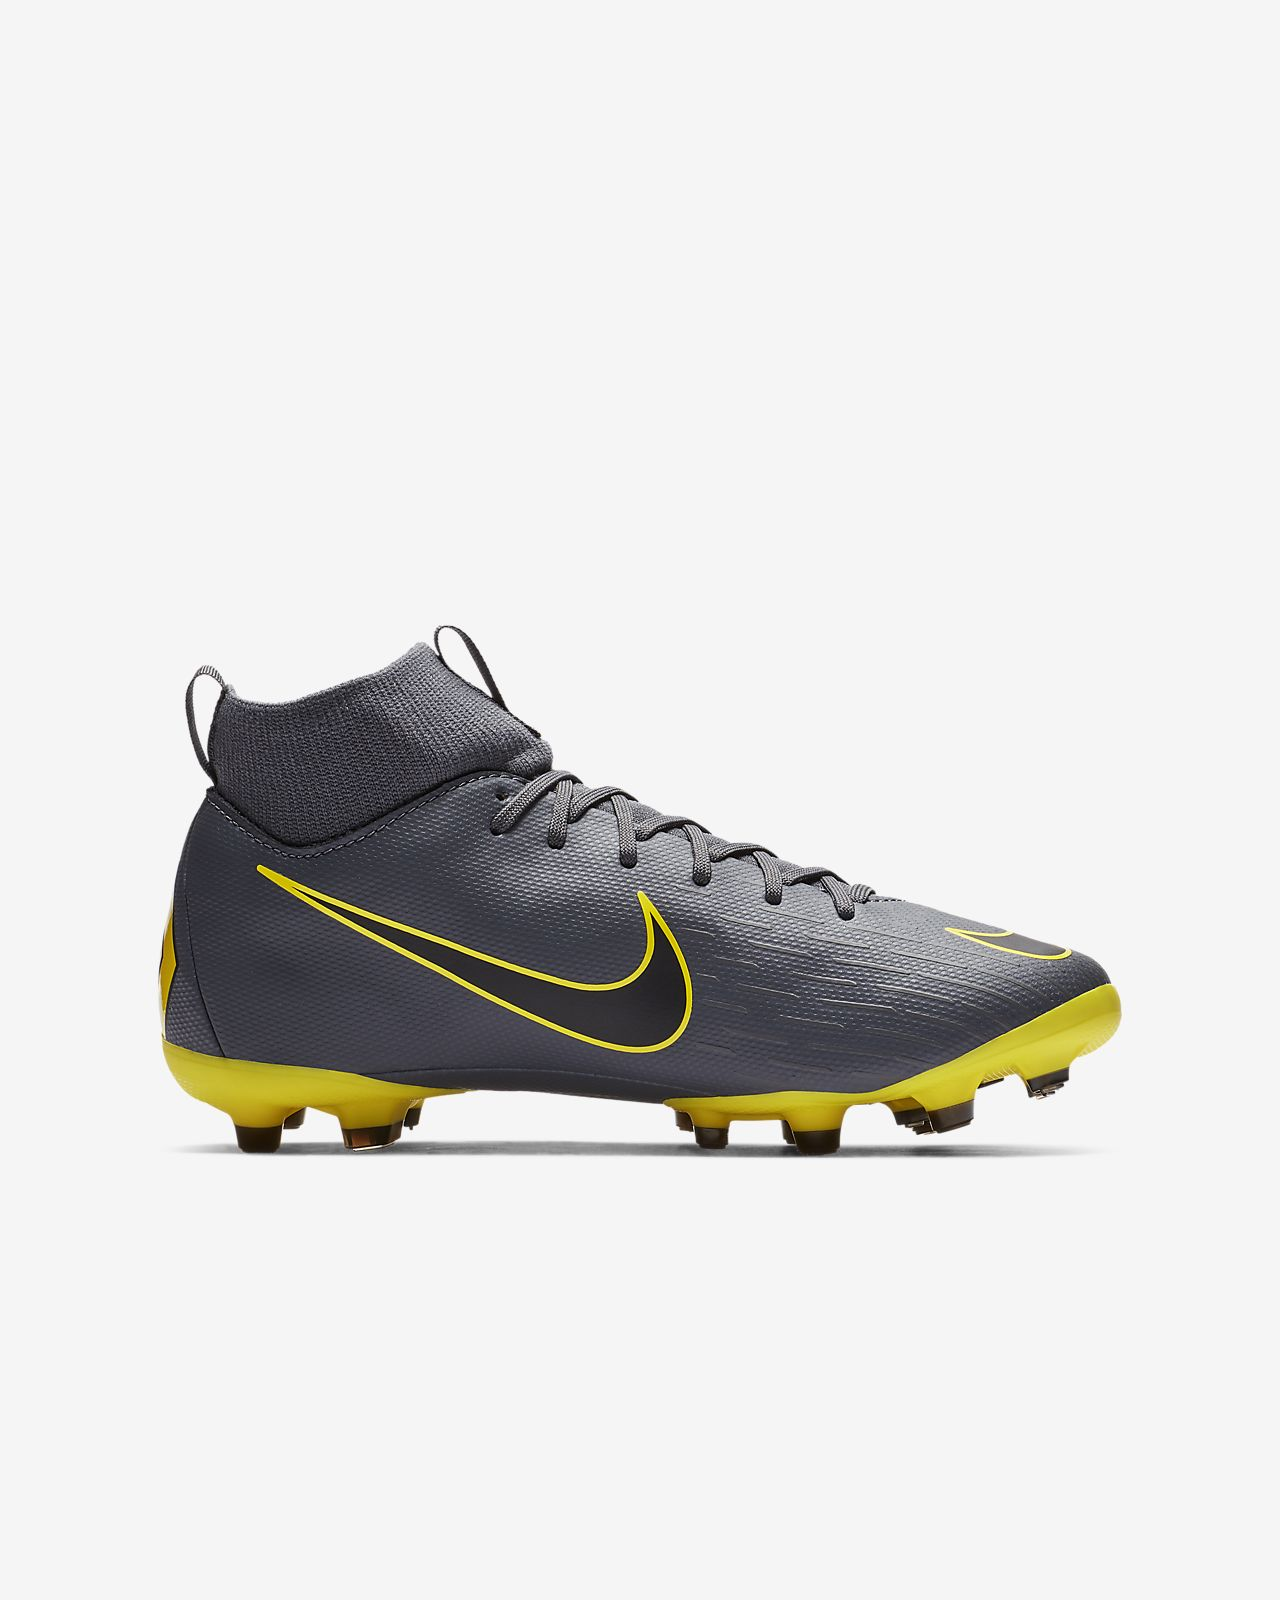 fb39a71ff3 ... Chaussure de football multi-terrains à crampons Nike Jr. Superfly 6  Academy MG Game